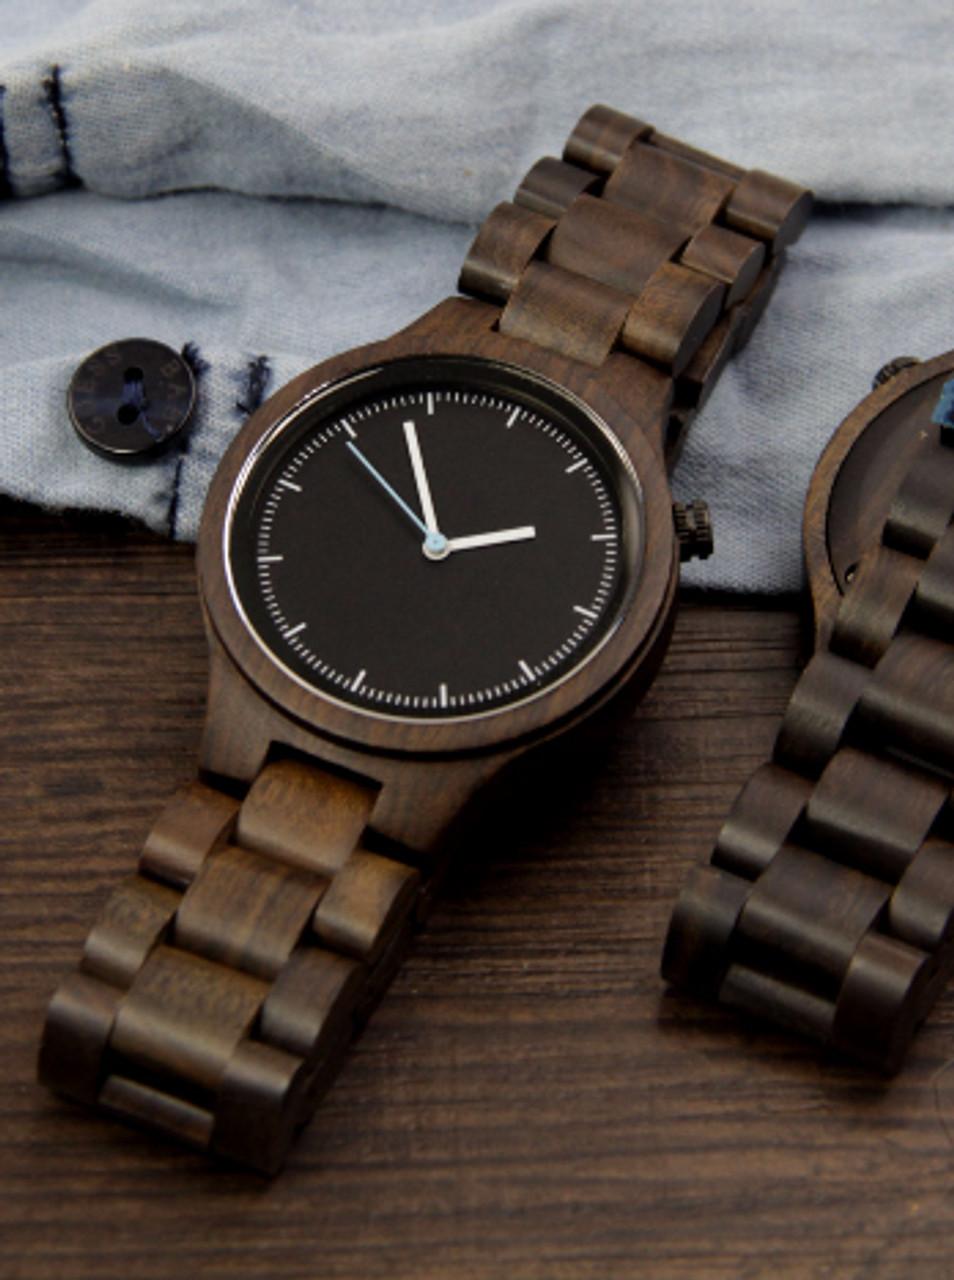 Grpn - Engraved Watch W#91